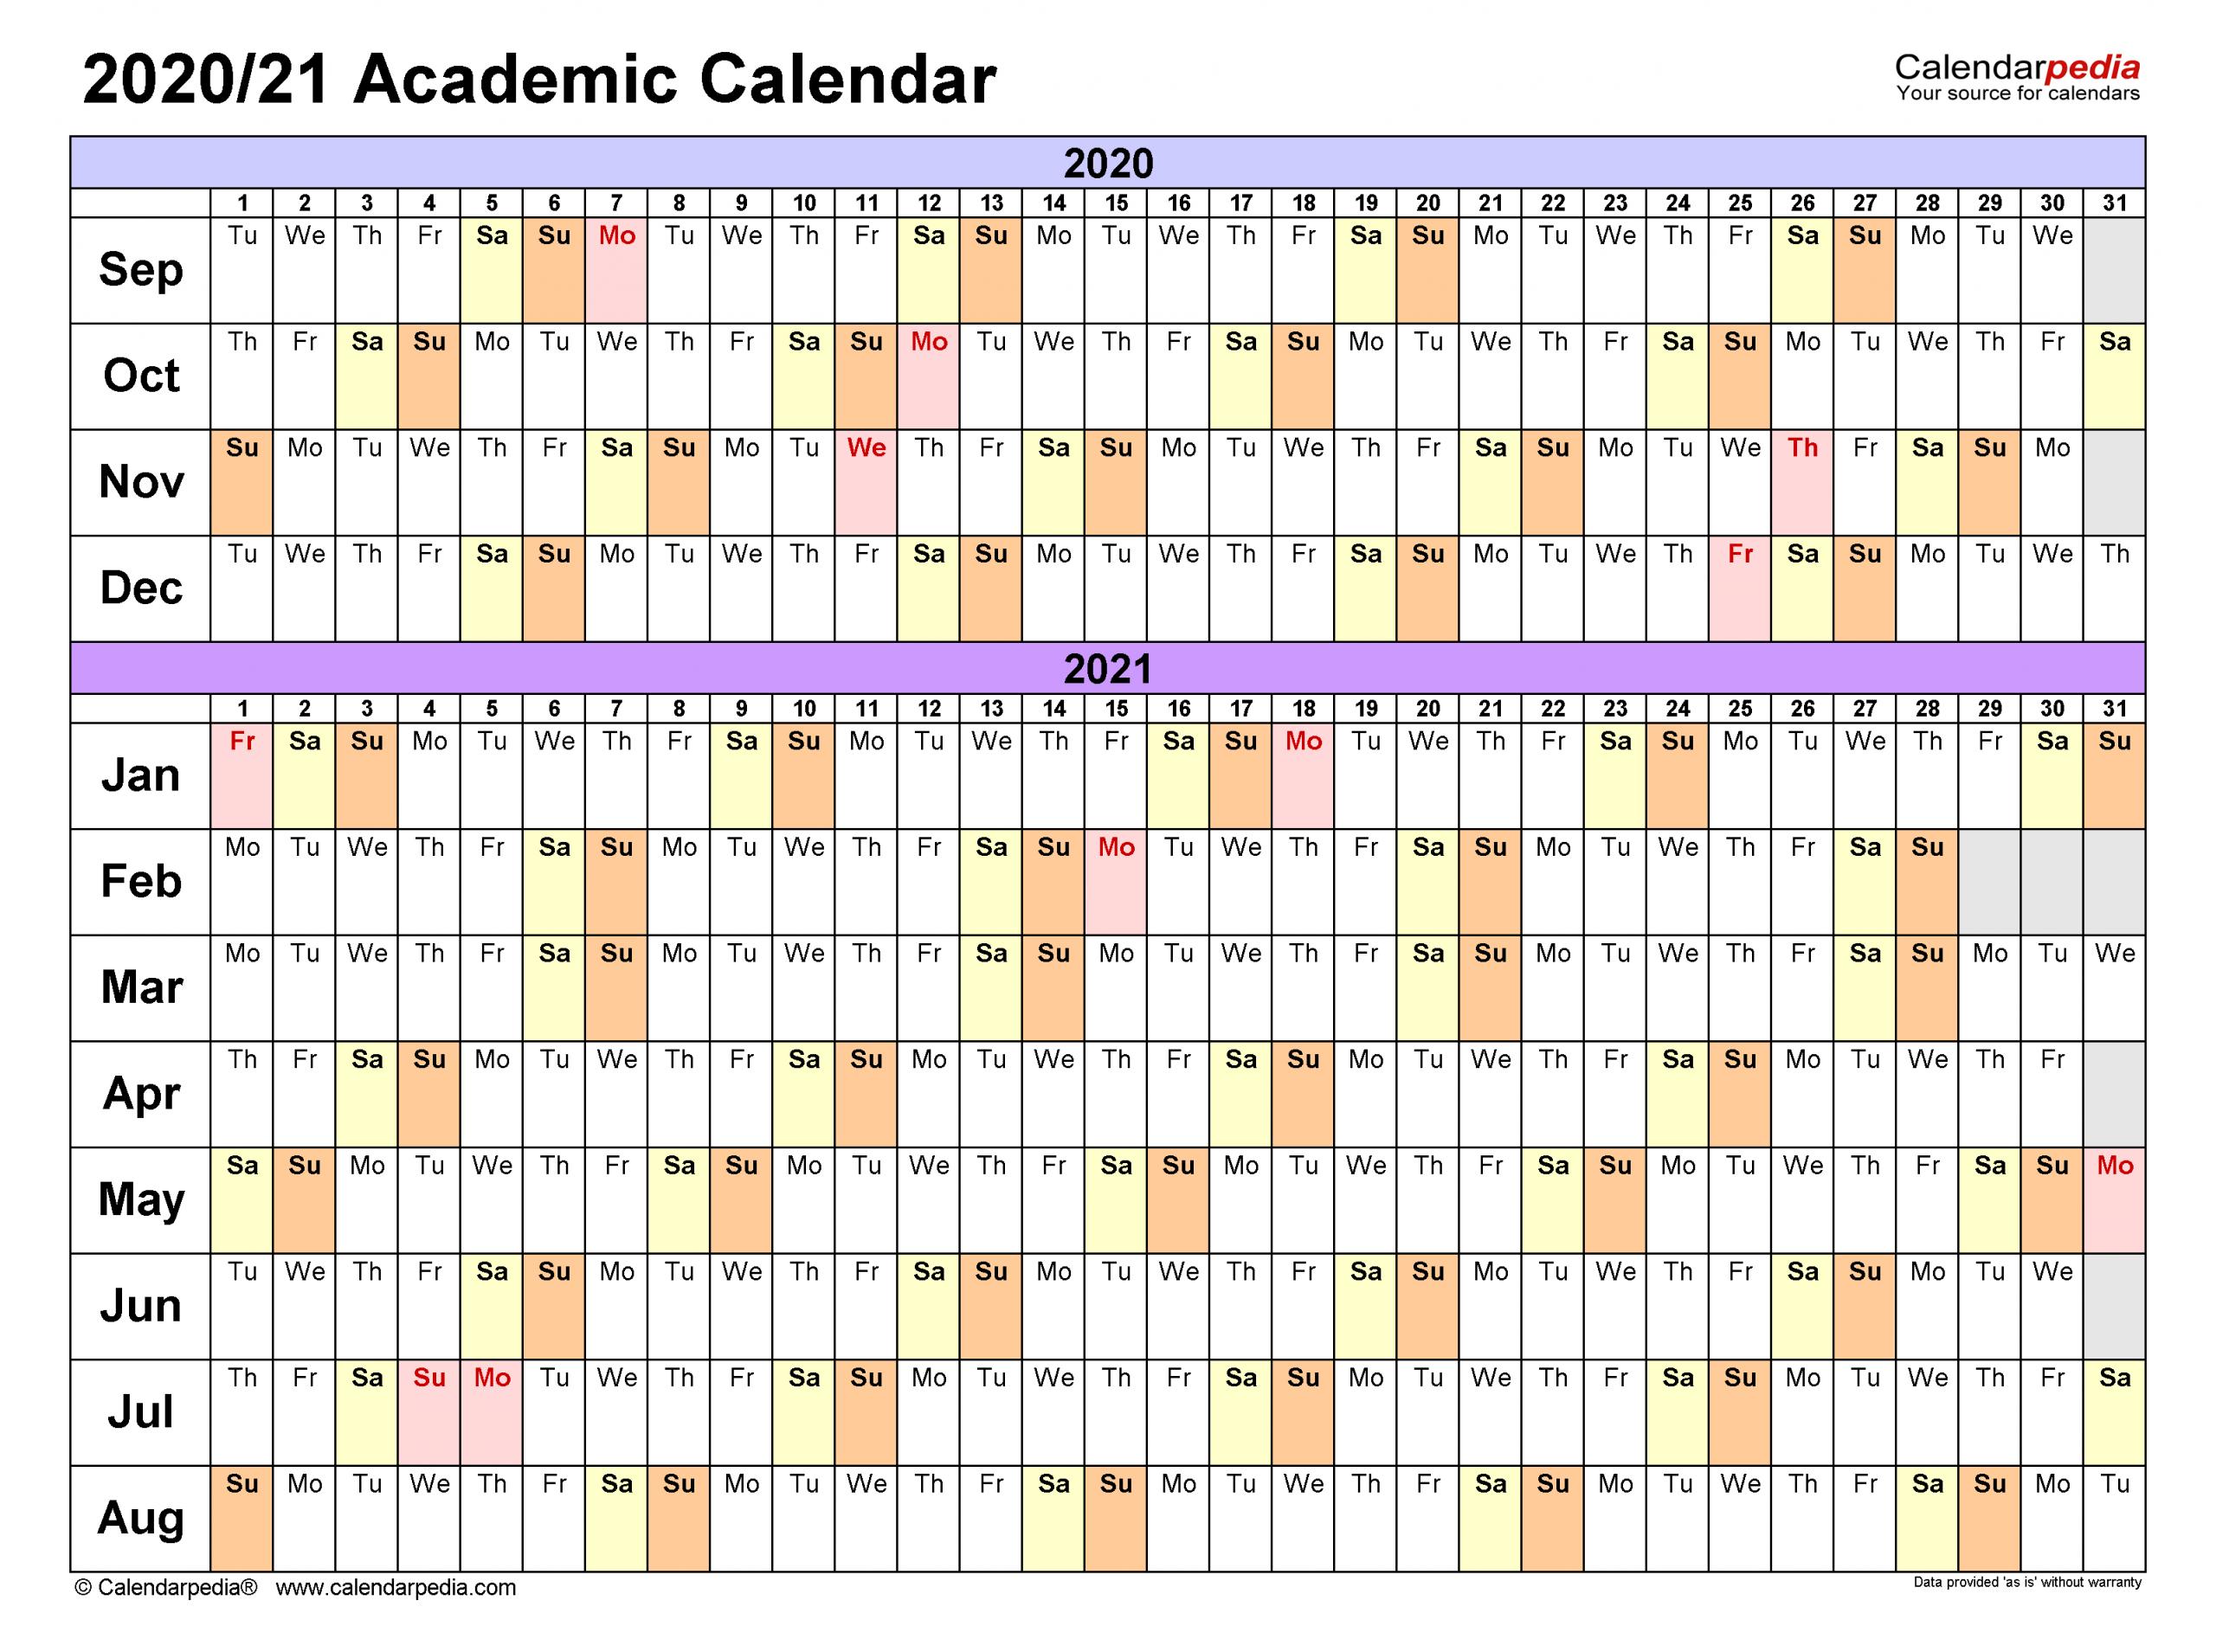 Academic Calendars 2020 2021 Free Printable Excel Templates